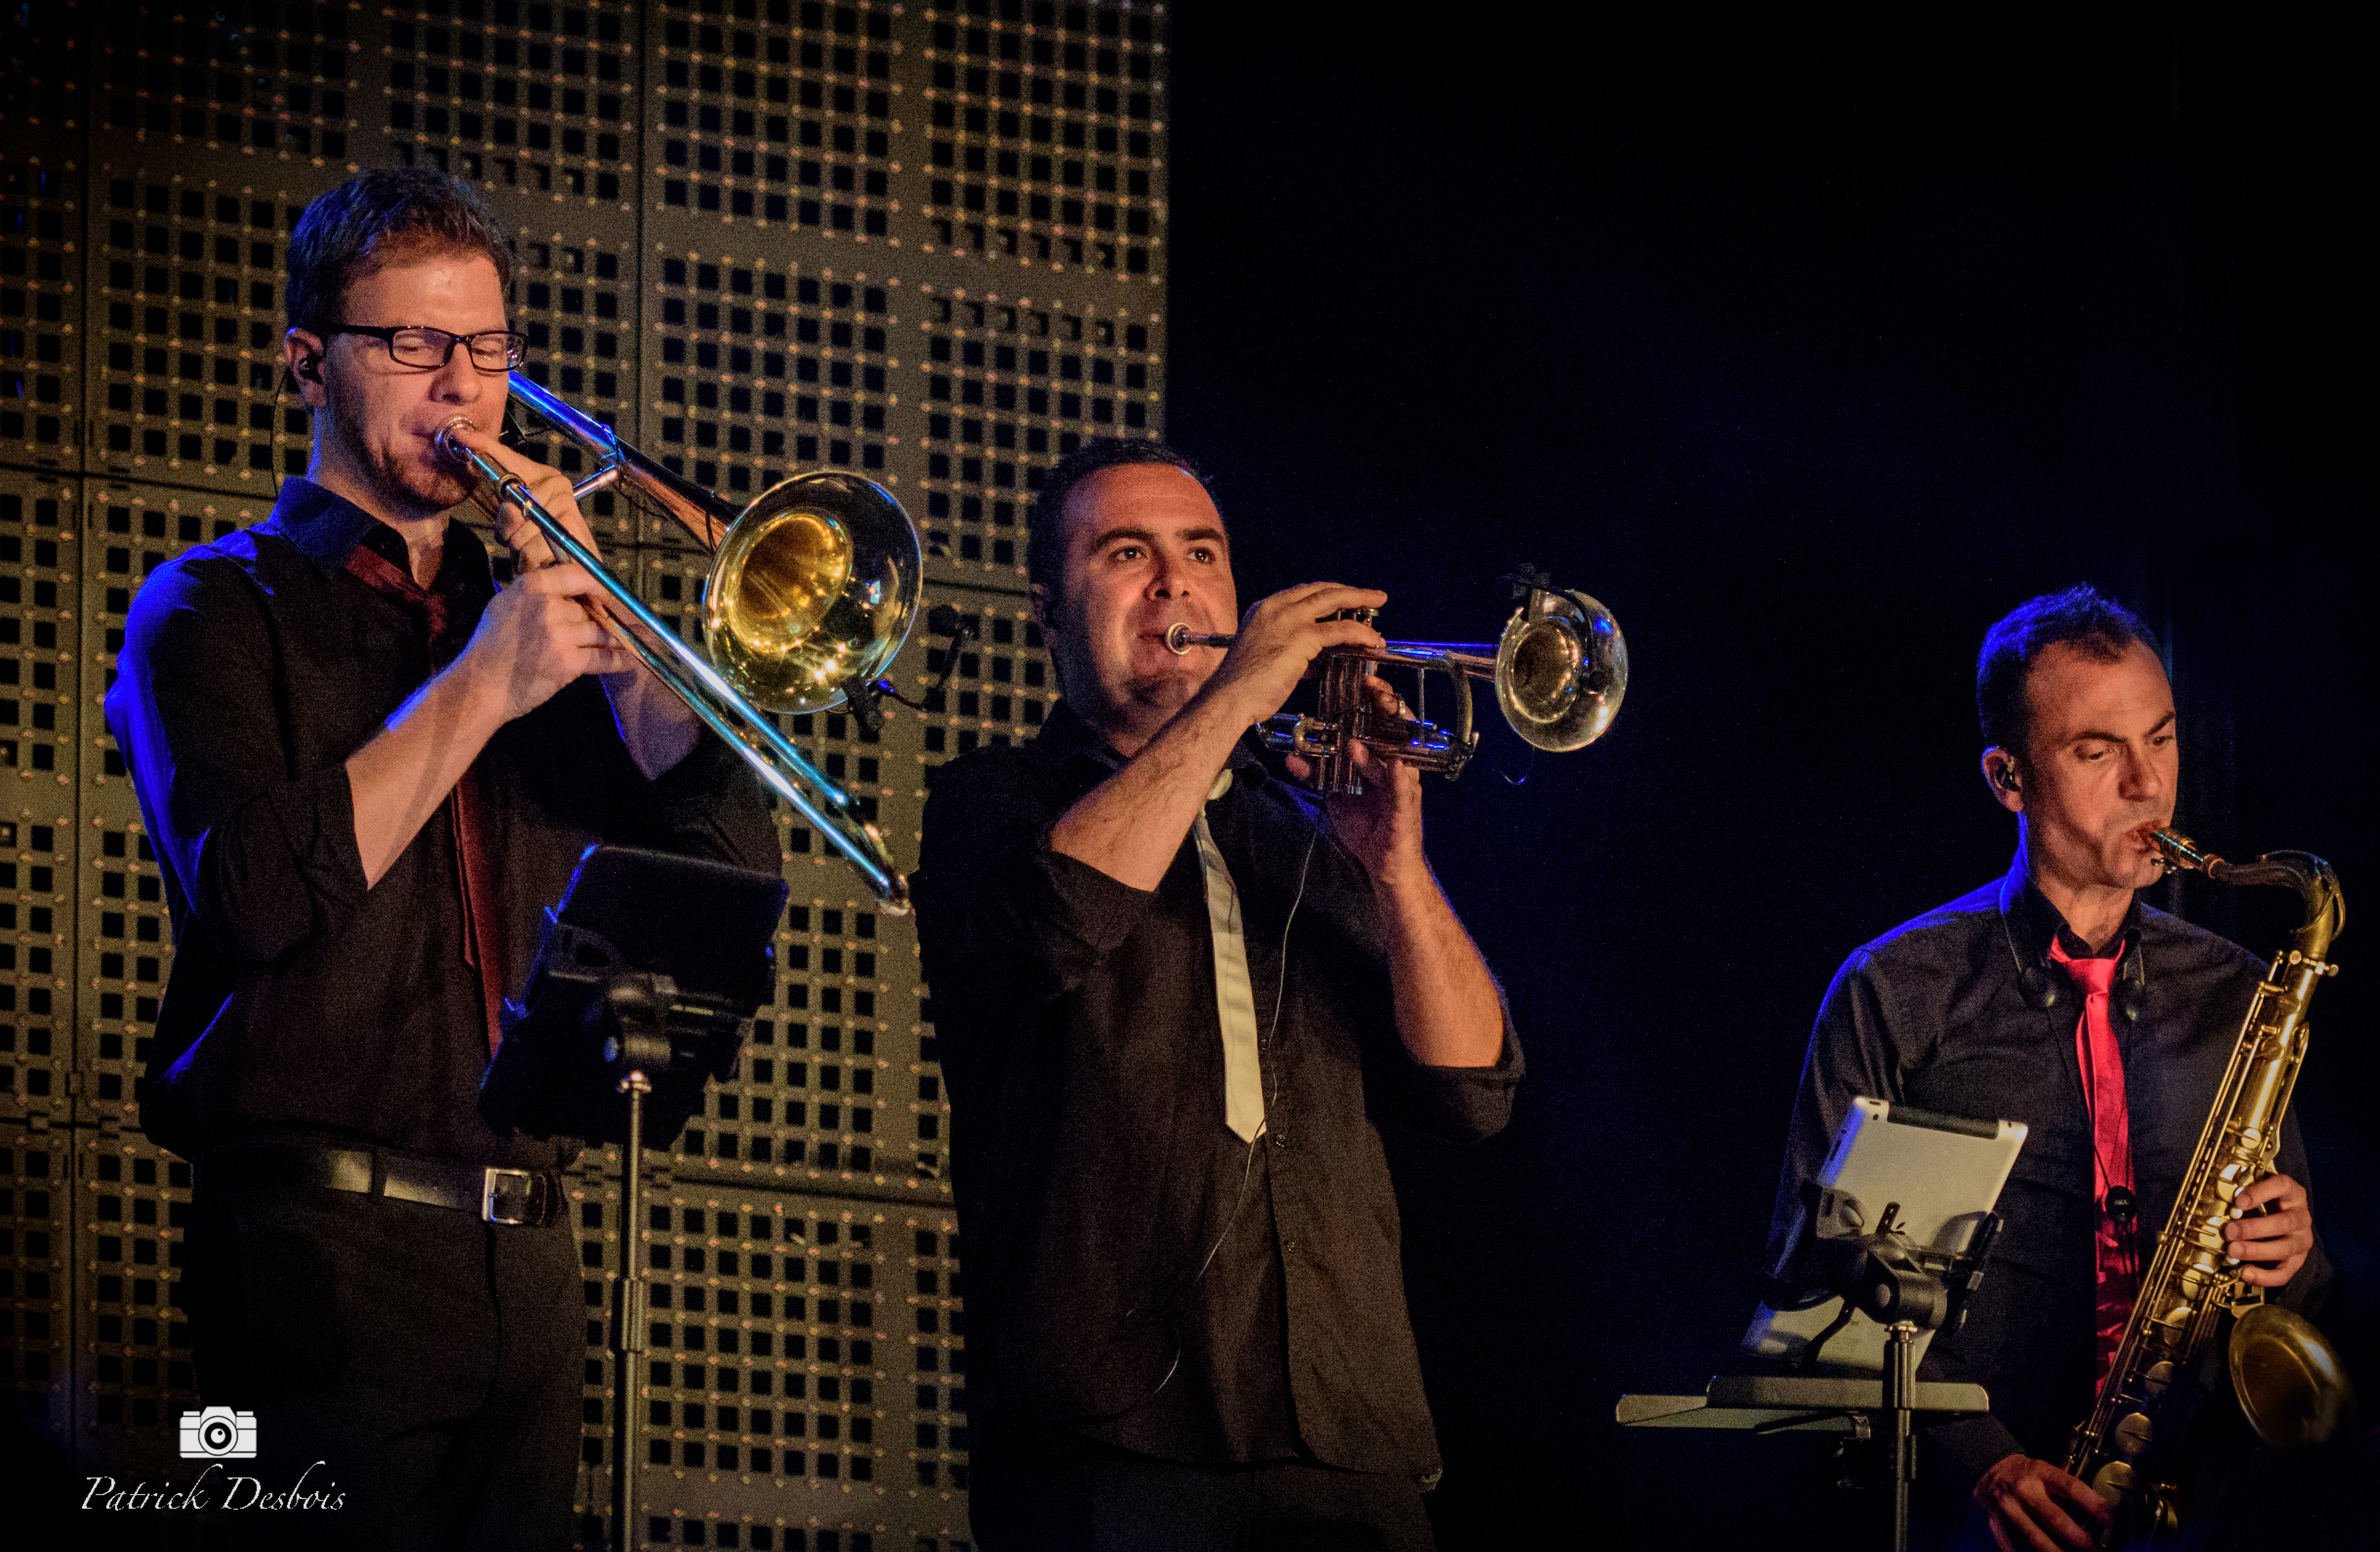 Orchestre Lacadanse